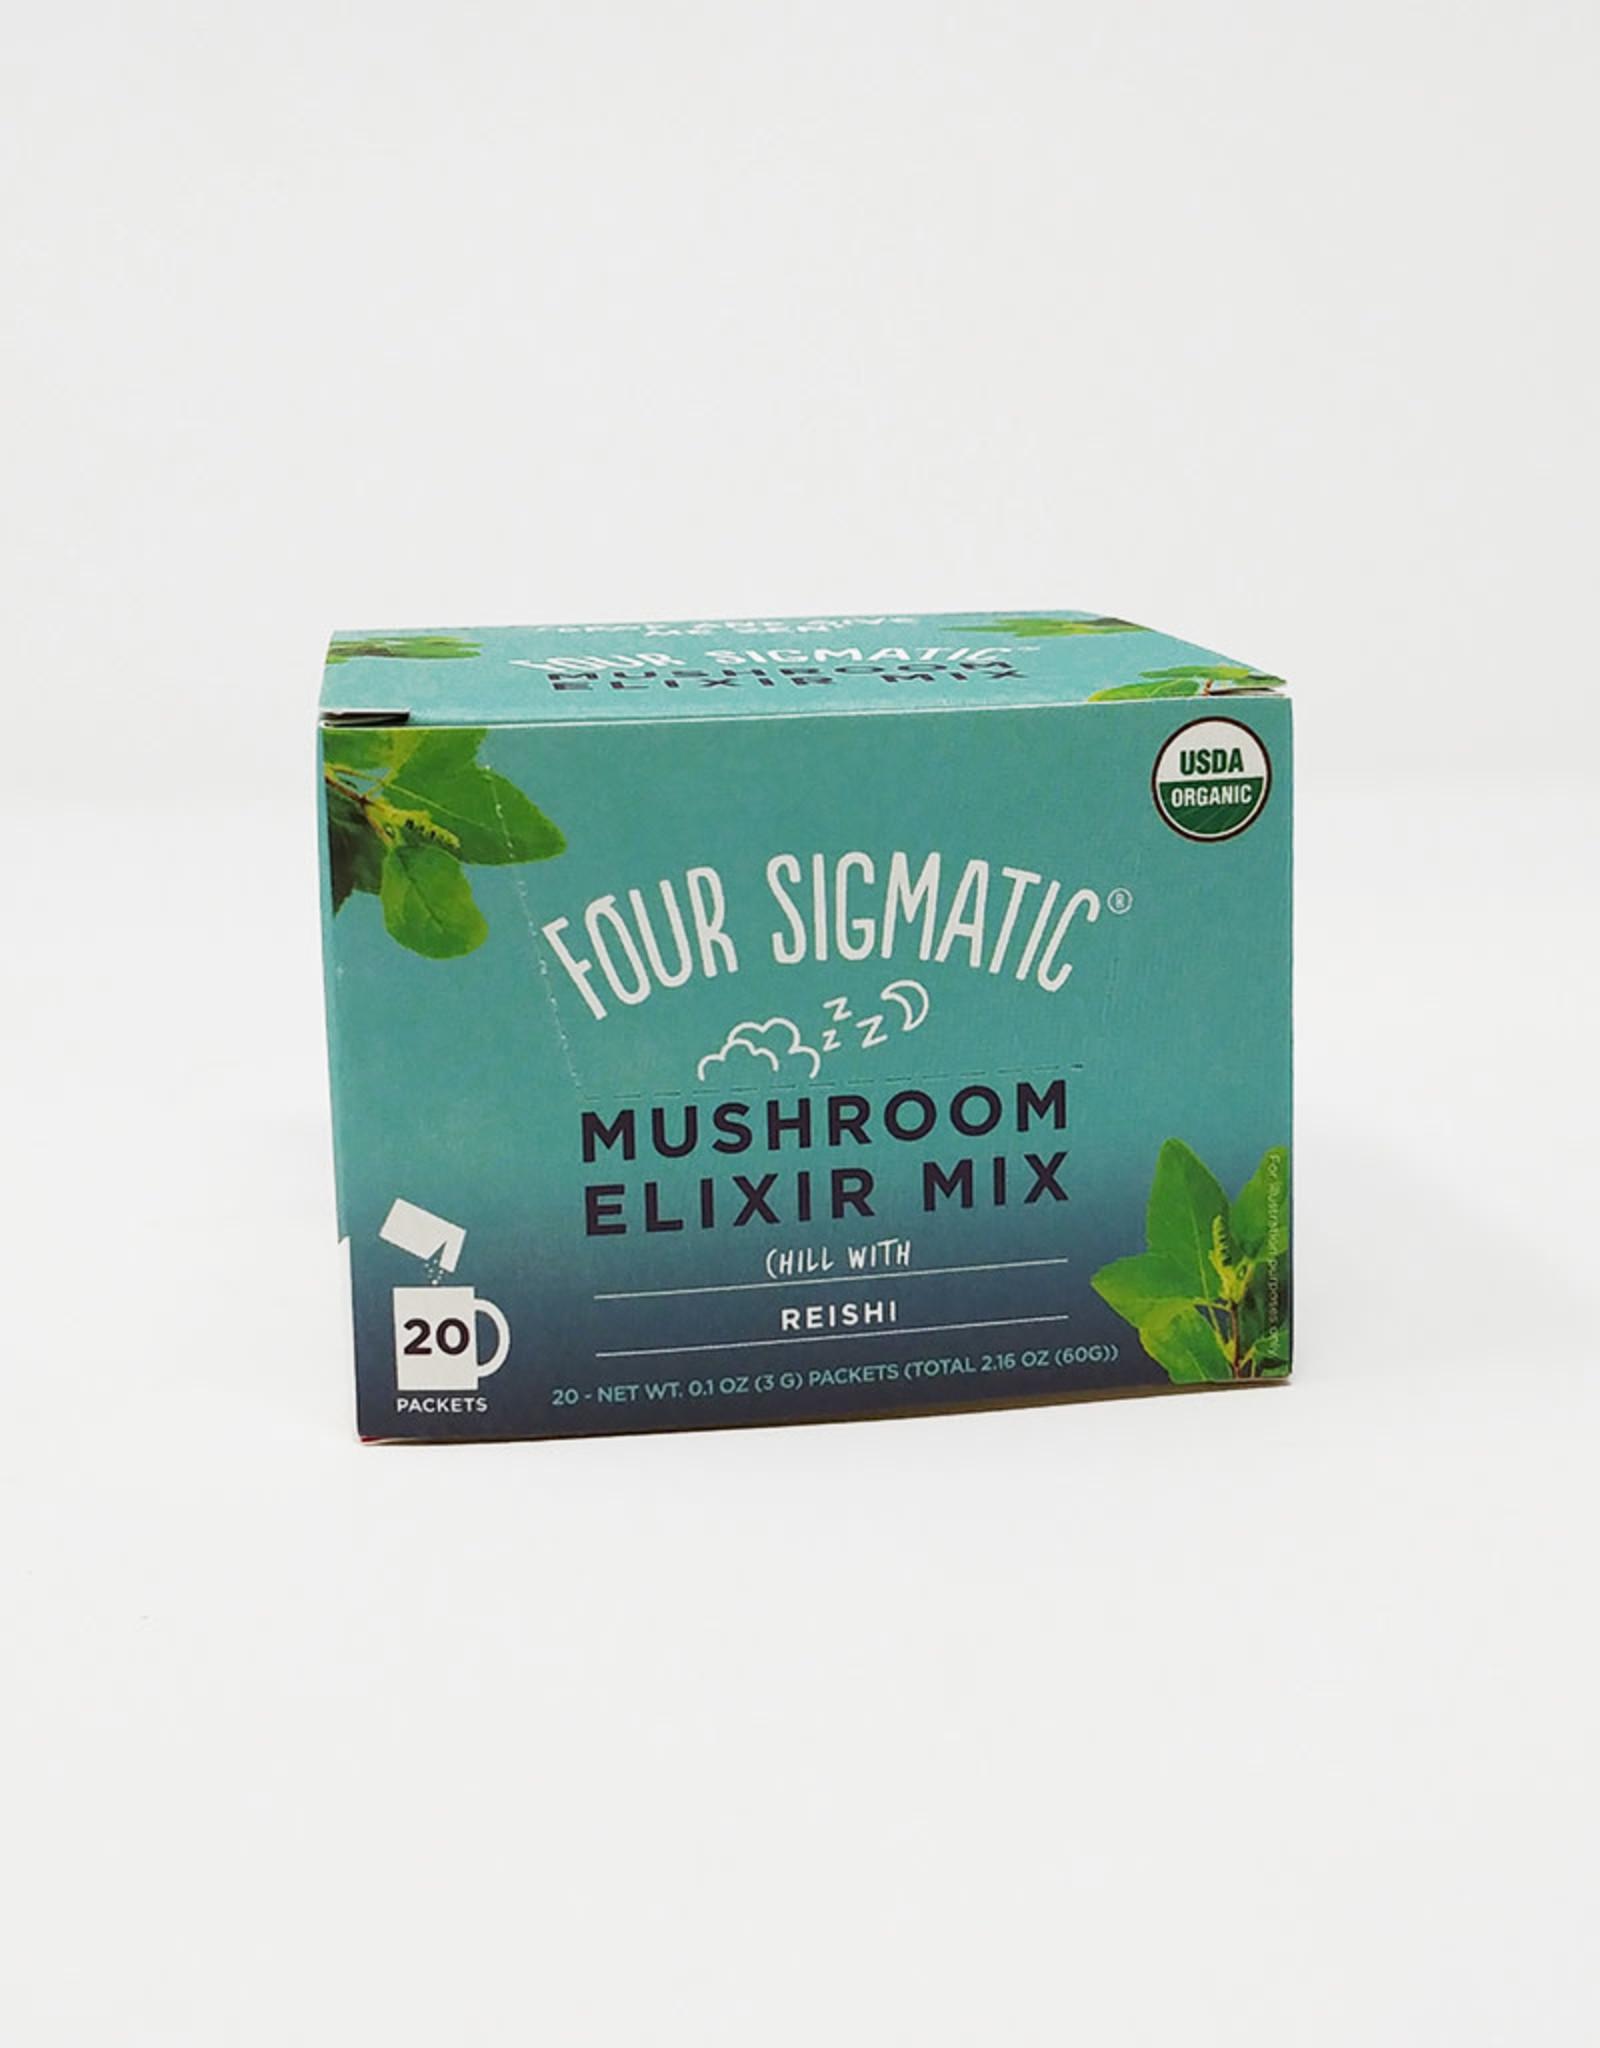 Four Sigmatic Four Sigmatic - Mushroom Elixir, Instant Reishi (Box of 20)